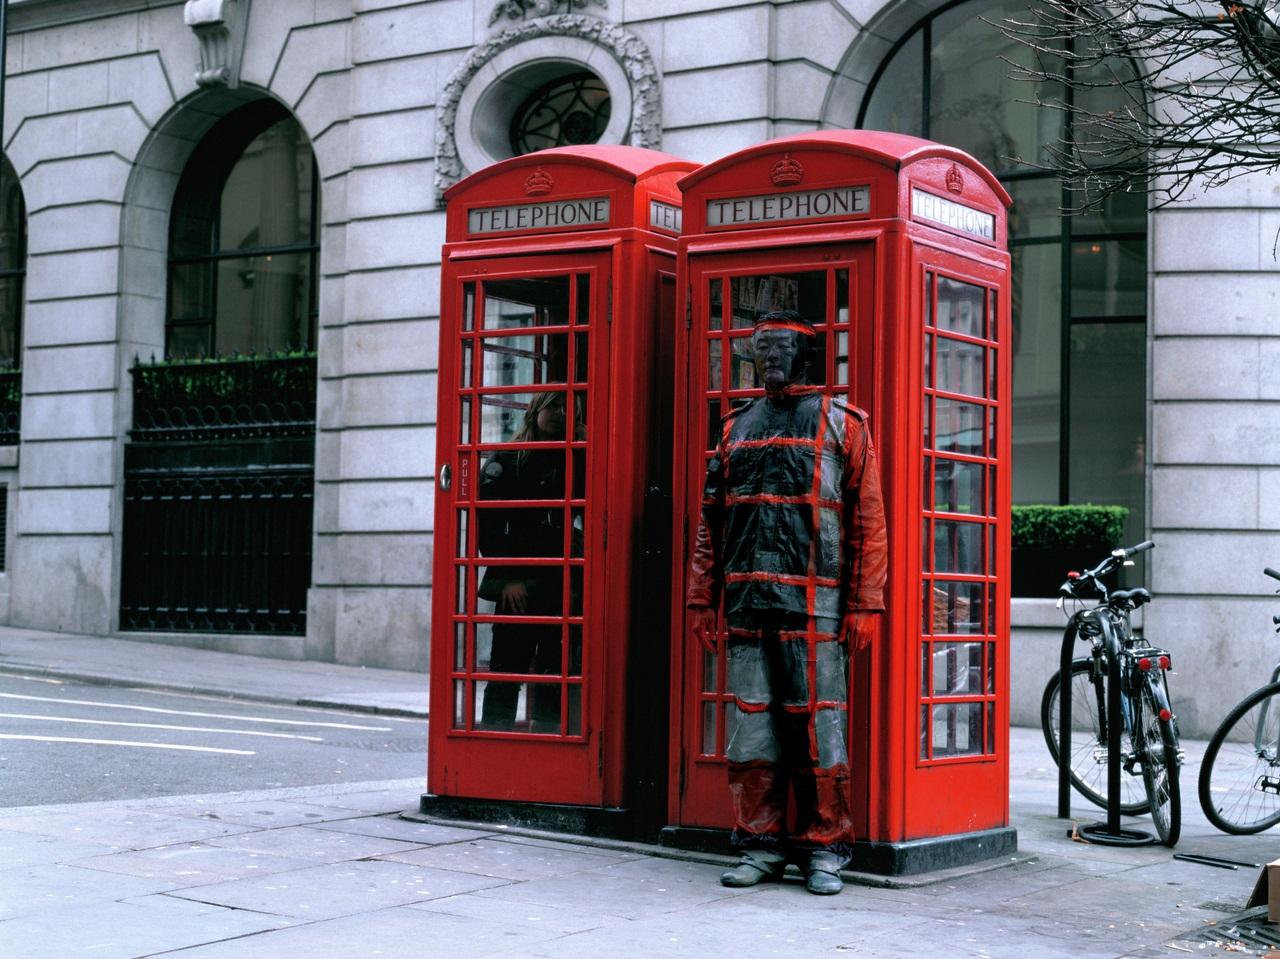 liu_bolin_hitc_no.65_telephone_booth_photograph_118x150cm_2008